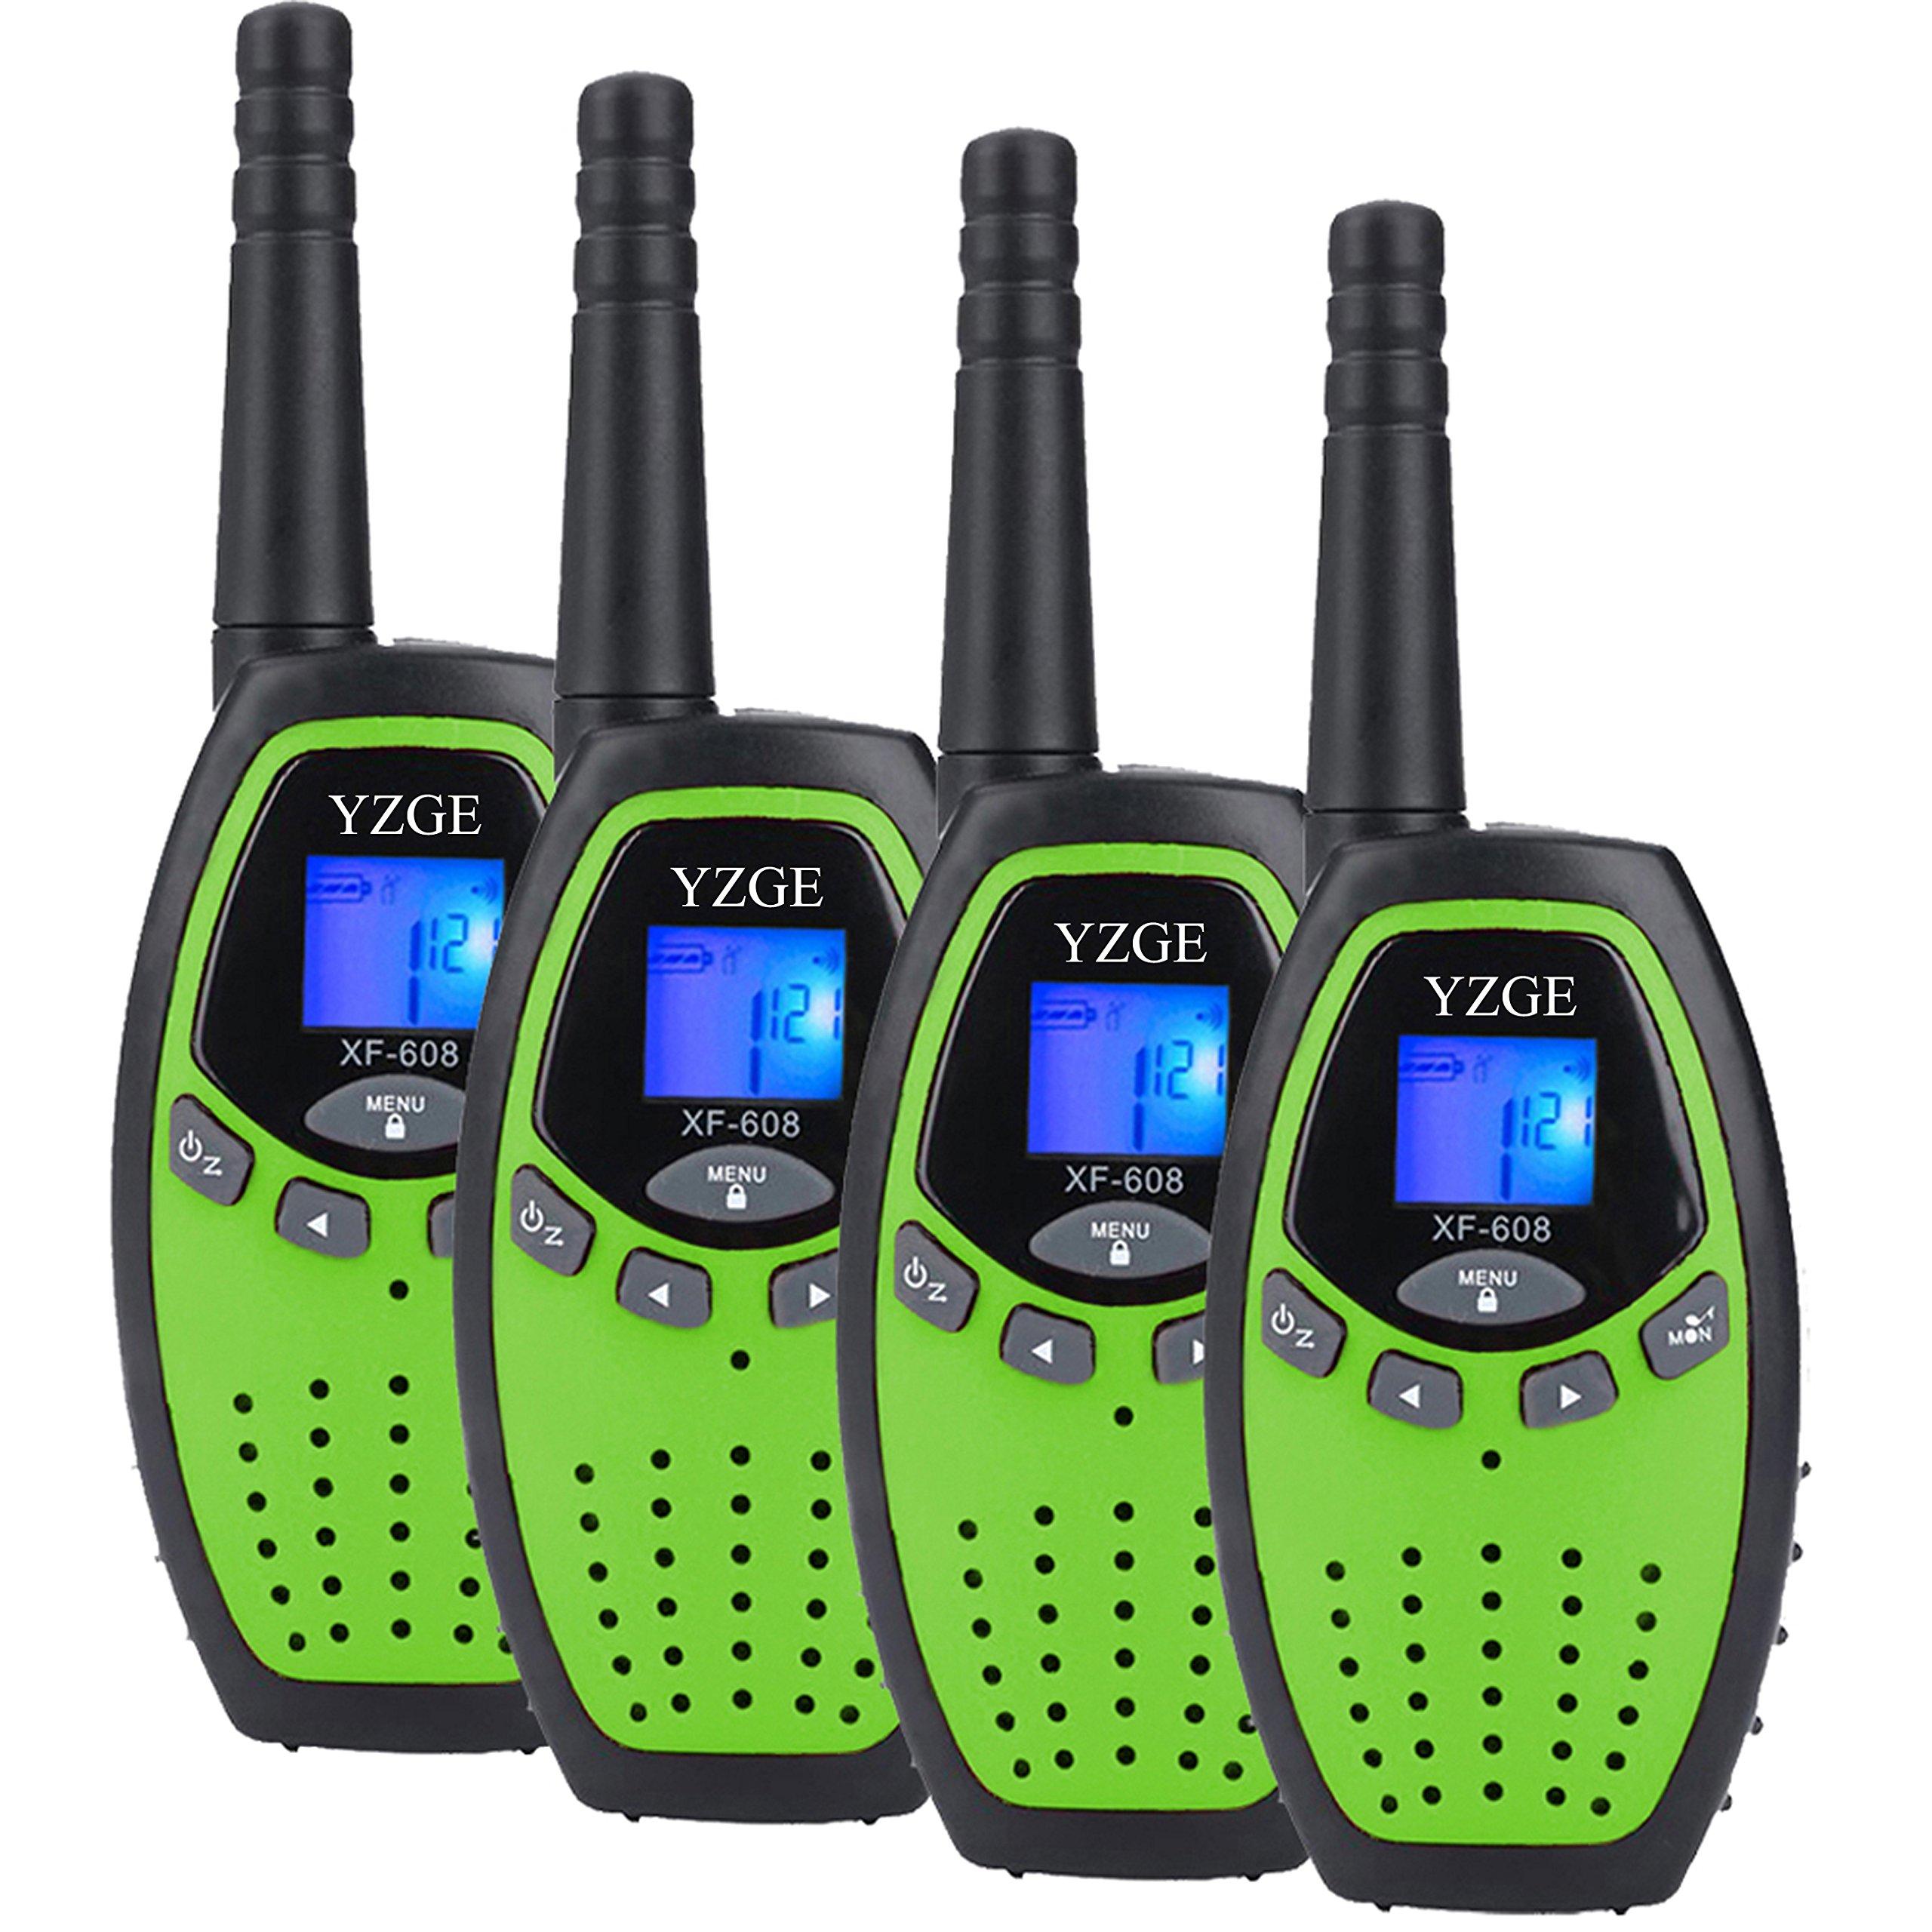 YZGE Walkie Talkies for Kids Two Way Radios Long Range 3km-5km Handheld Walkie Talky 22 Channel Walkie Talkies for Kids Toys for Boys Girls Outdoor(Green,4 Pack)